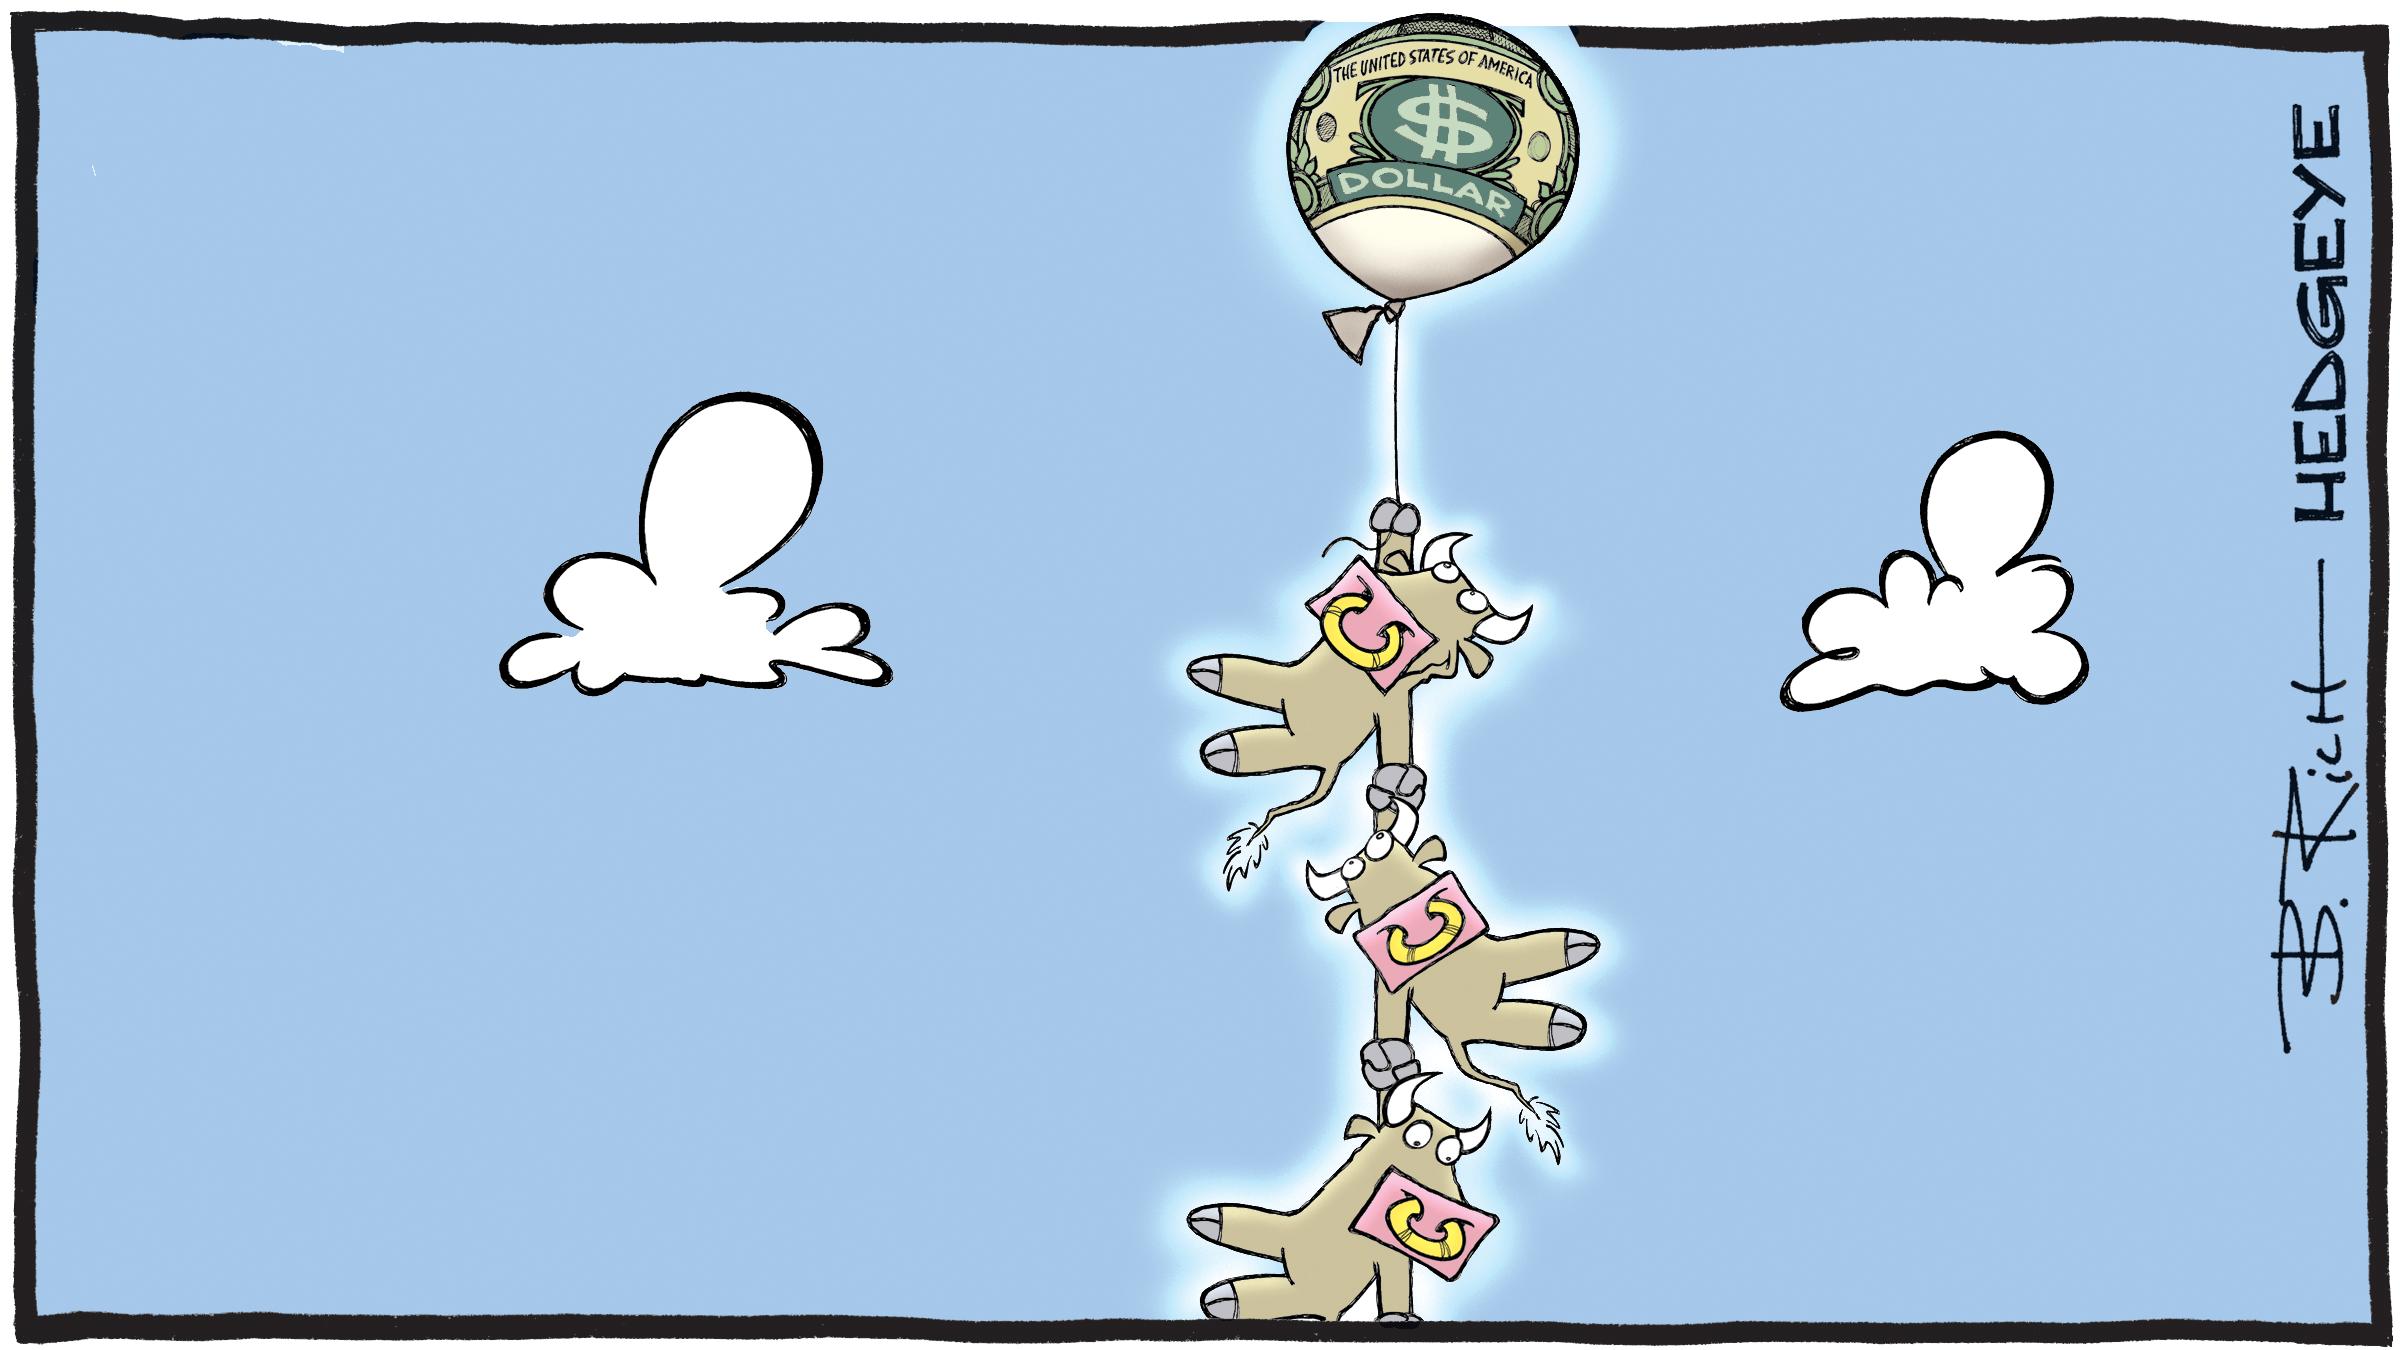 Risultato immagini per strong dollar cartoons